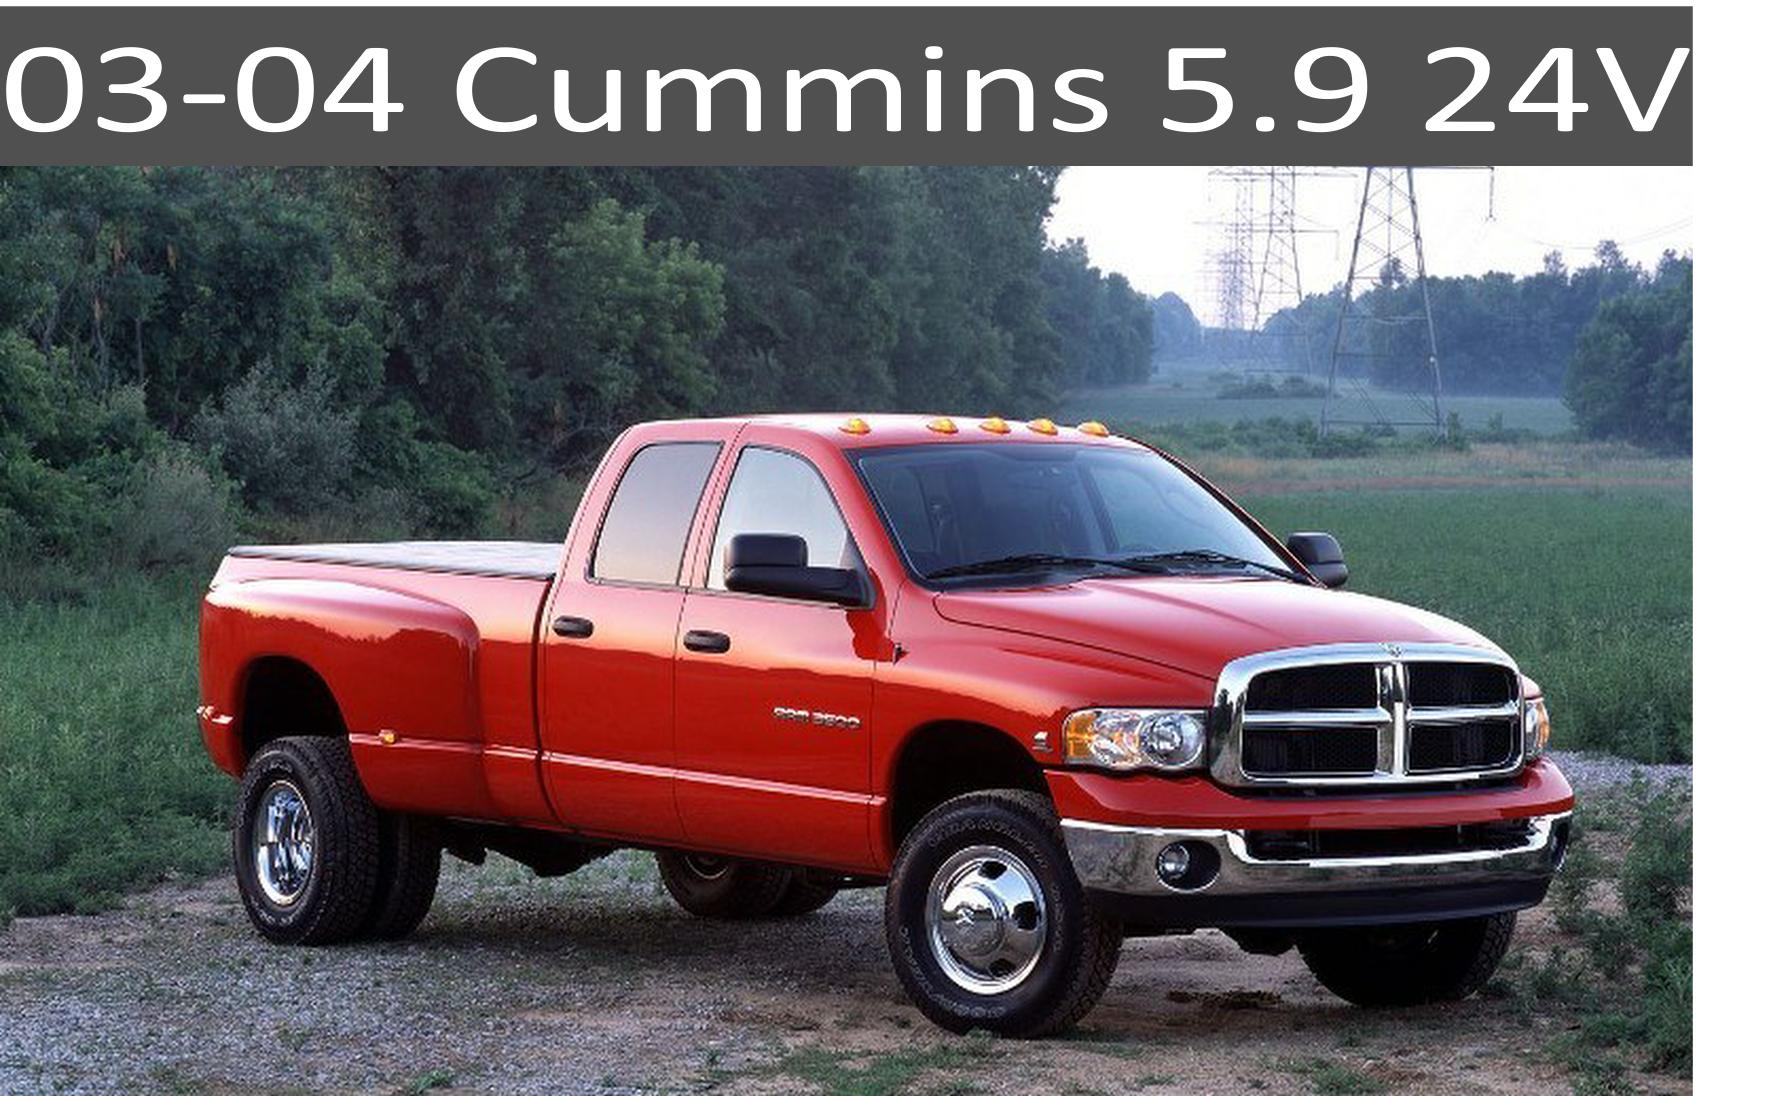 03-04 Dodge 5.9 Cummins parts